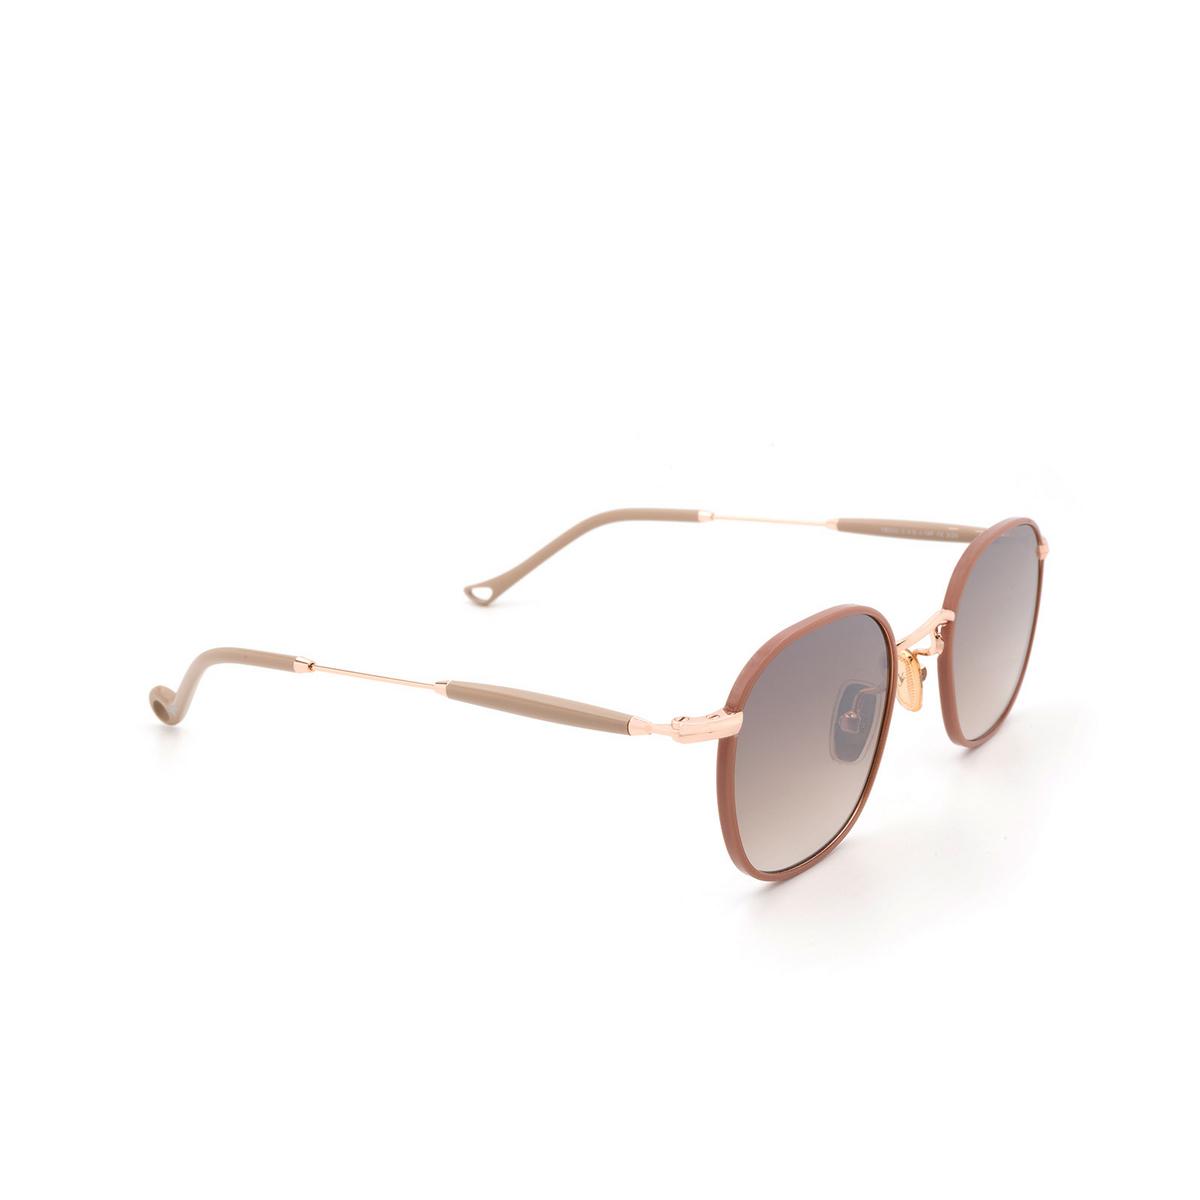 Eyepetizer® Square Sunglasses: Trois color Pink C.9-E-J-18F - three-quarters view.